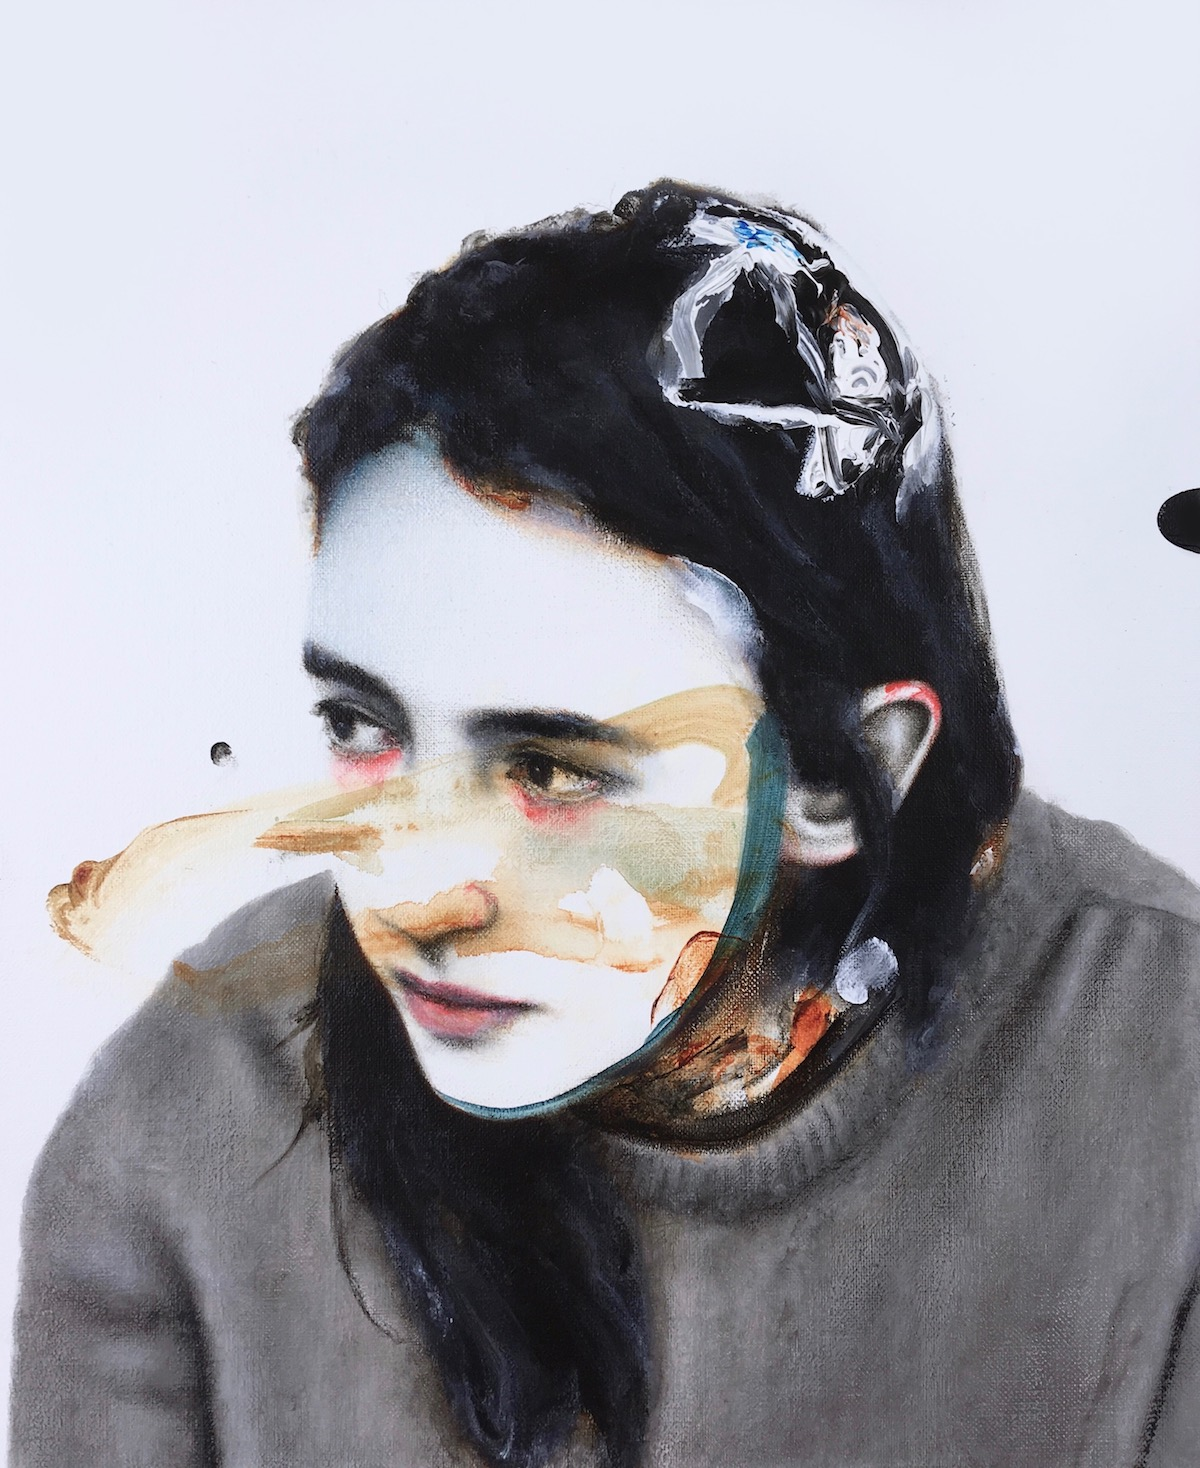 antoine cordet canvas toile peinture painting portrait art artist artiste peintre acrylic oil the senseless speech